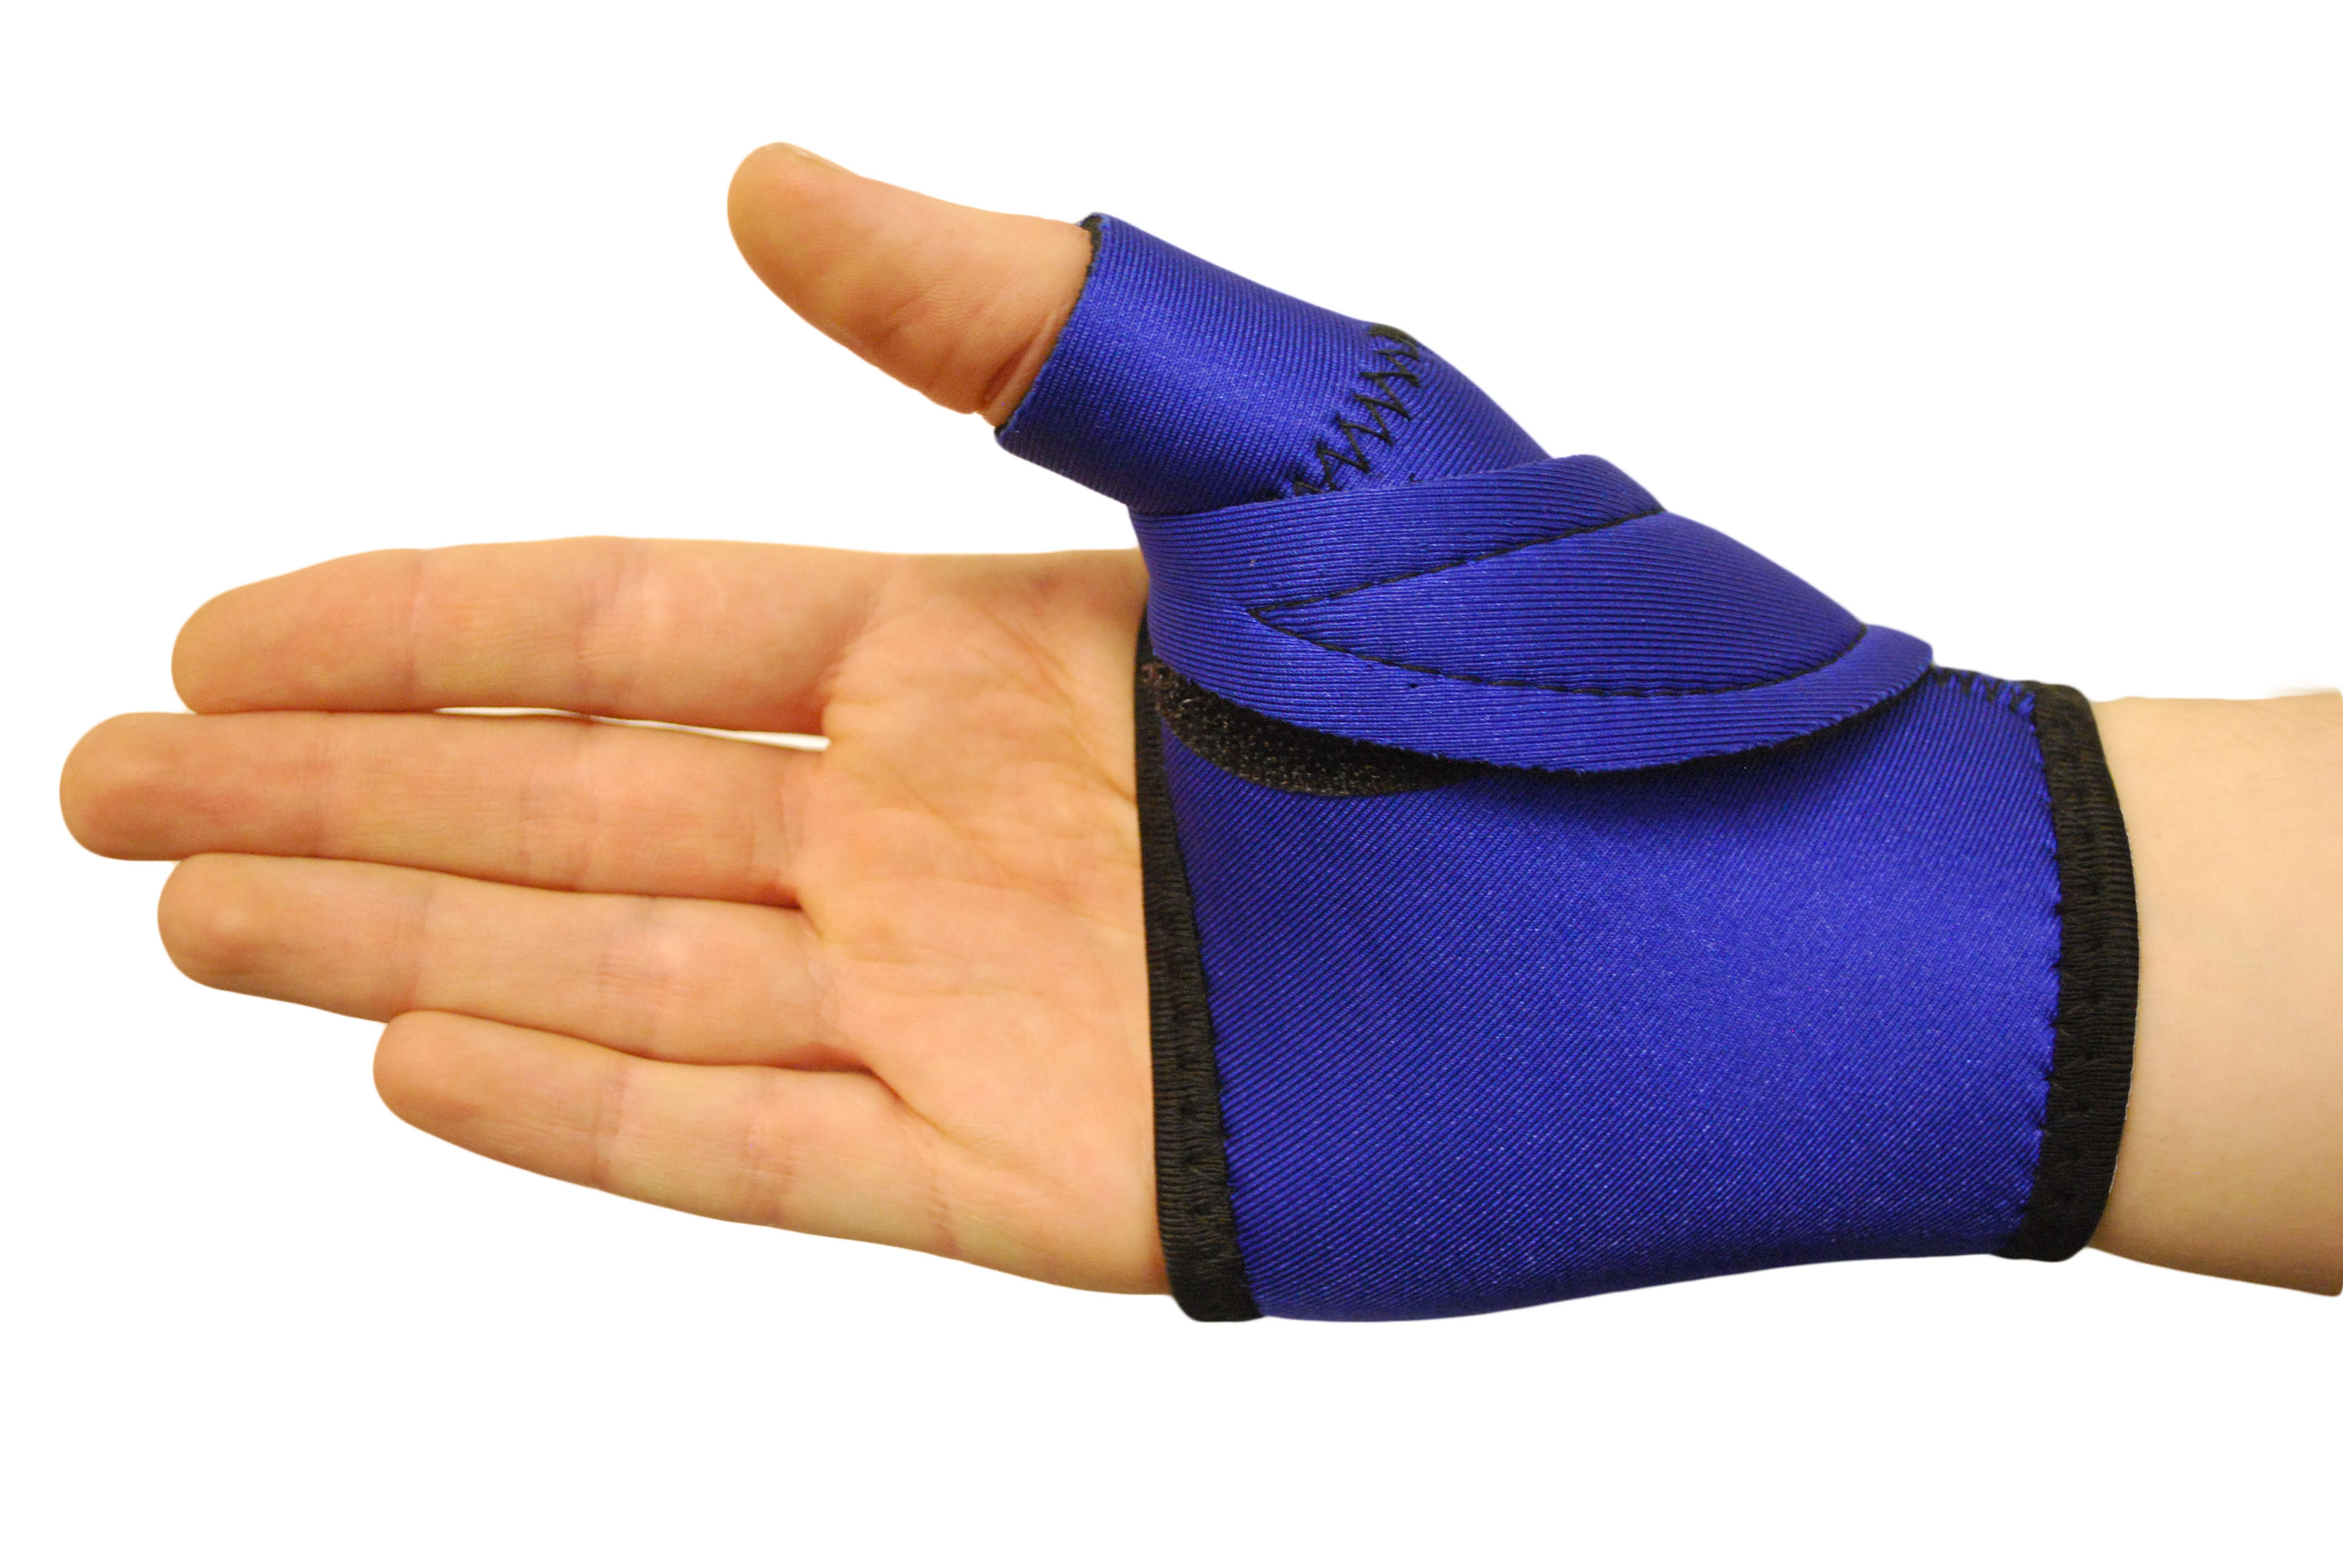 how to make thumb spica splint